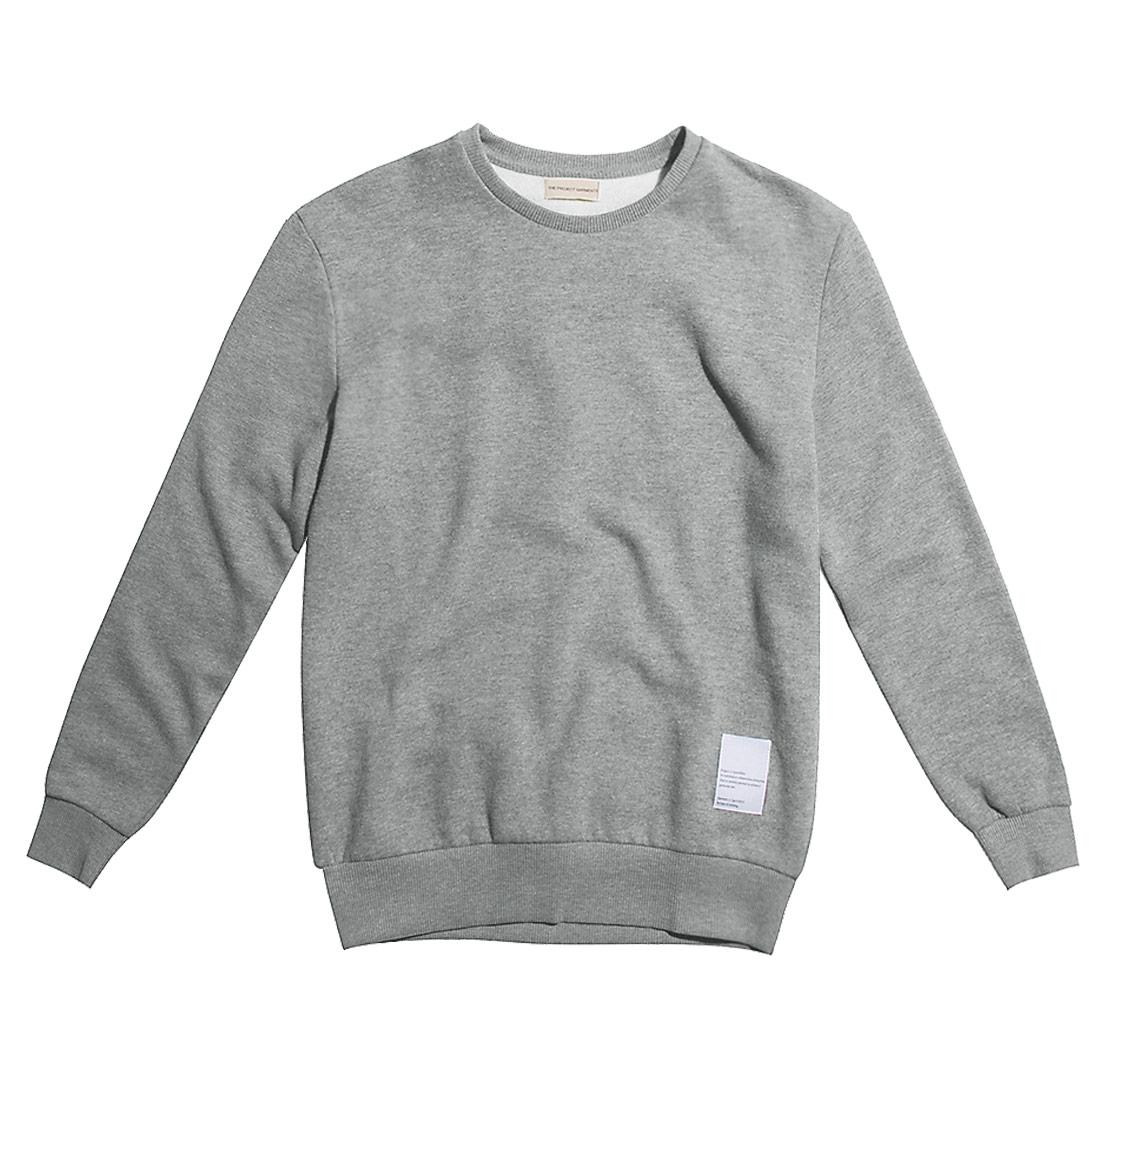 Logomania Crew Neck Sweatshirt Melange Grey